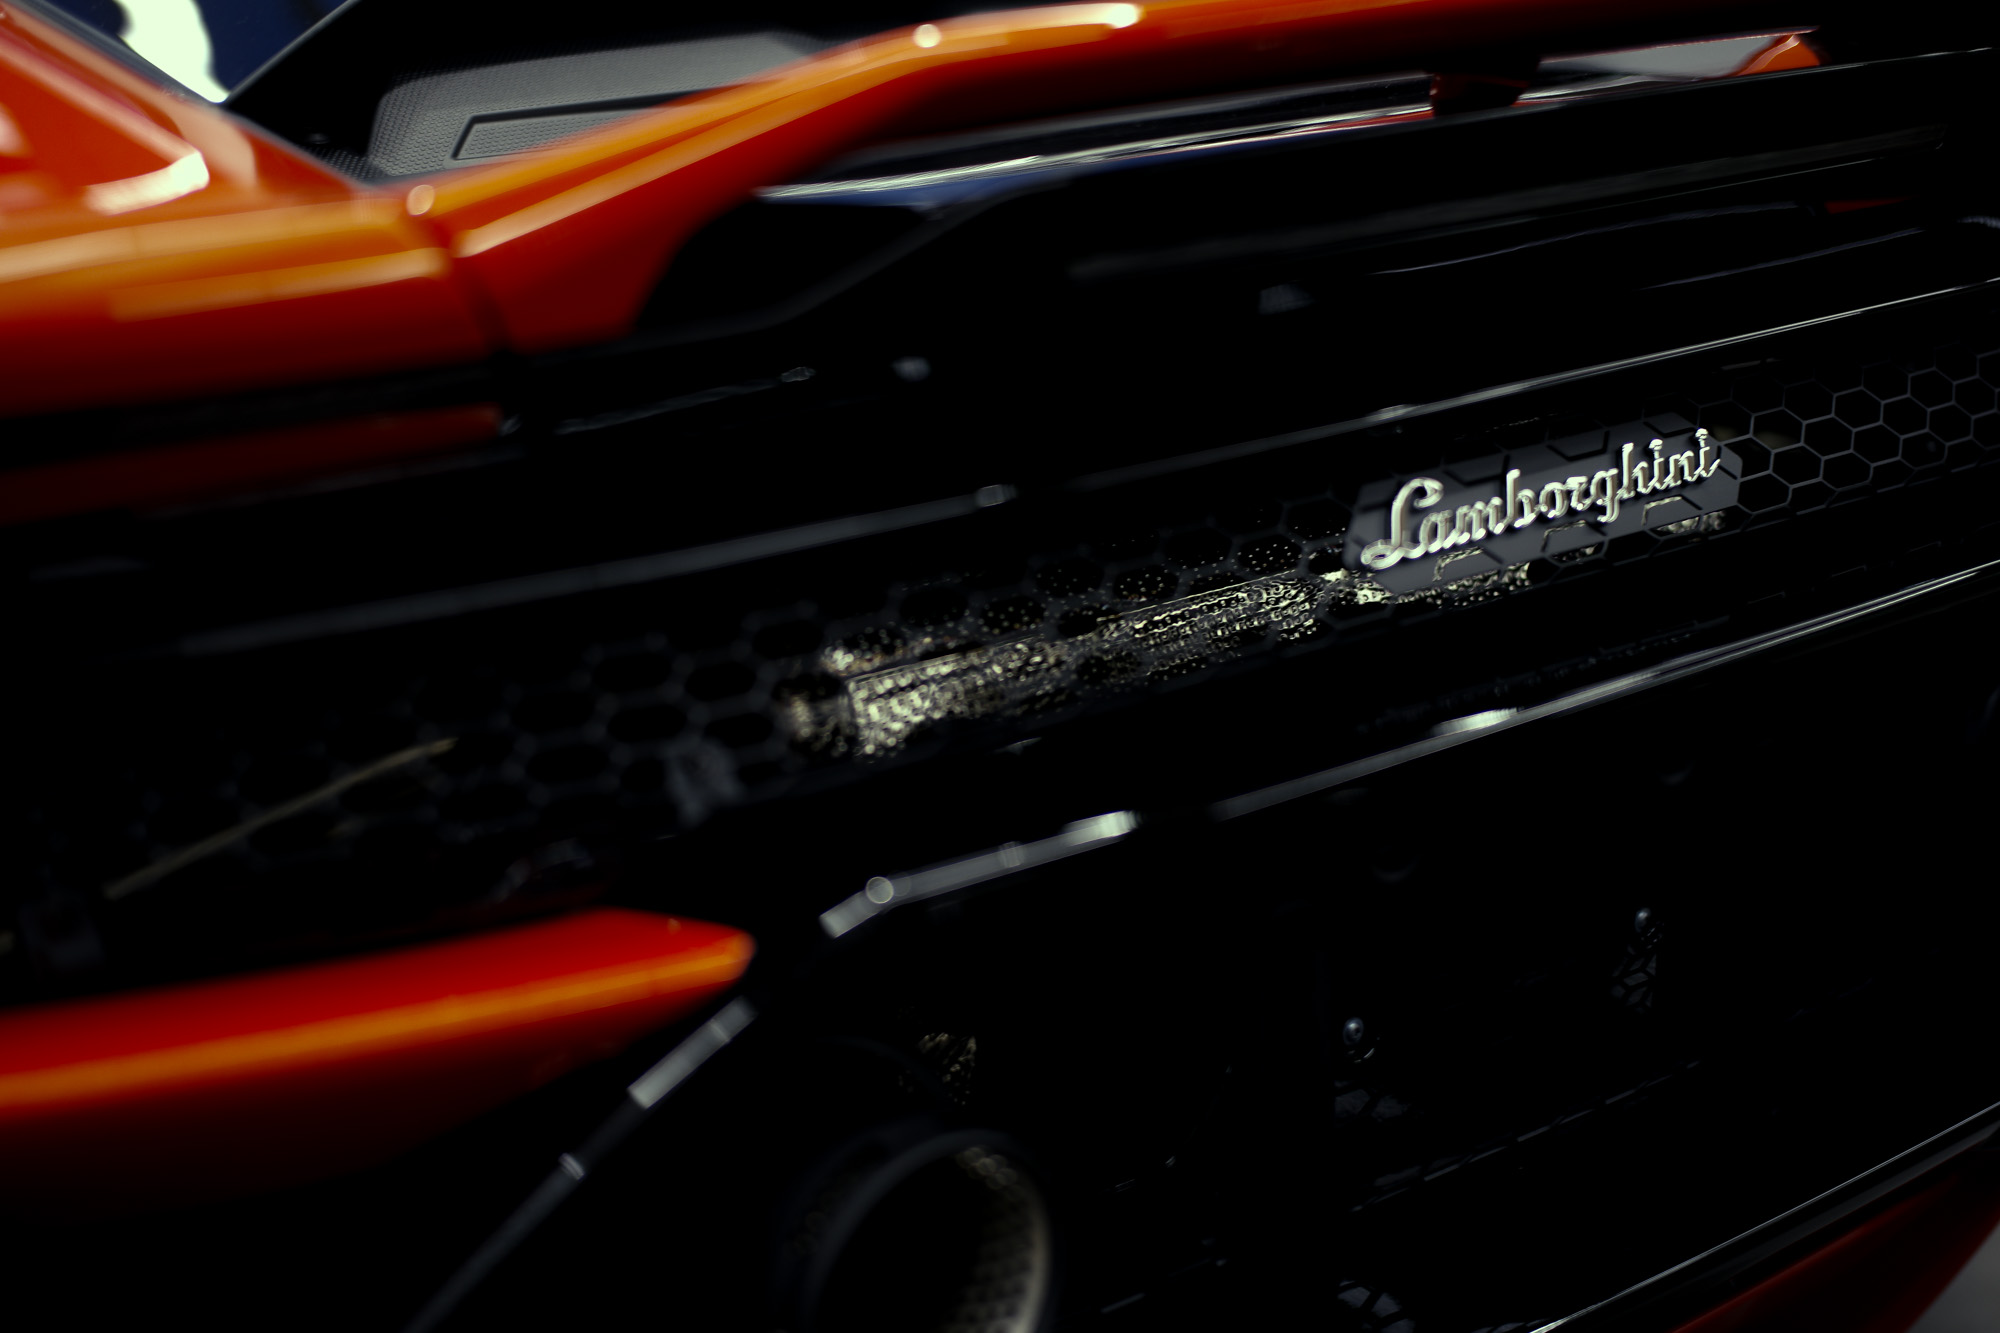 LAMBORGHINI HURACAN ランボルギーニ ウラカン HURACAN EVO ウラカン イーヴォ エヴォリューション 愛知 名古屋  HURACAN EVO SPYDER スパイダー URUS ウルス AVENTADOR S アヴェンタドール AVENTADOR S ROADSTER ロードスター AVENTADOR SVJ AVENTADOR SVJ ROADSTER スーパーカー